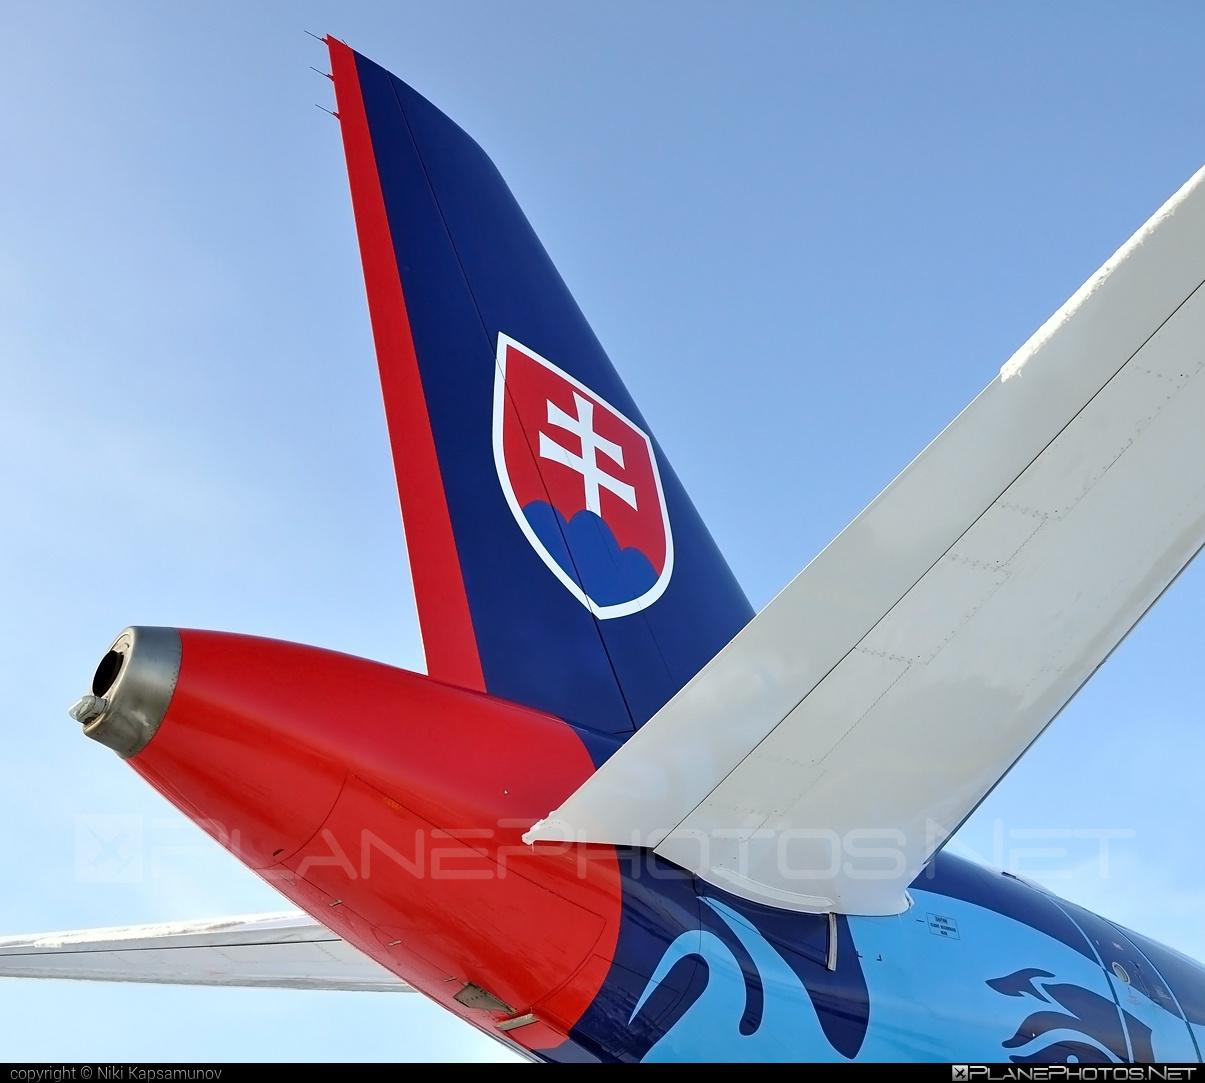 Airbus ACJ319-115 - OM-BYA operated by Letecký útvar MV SR (Slovak Government Flying Service) #acj319 #acj319115 #airbus #airbuscorporatejet